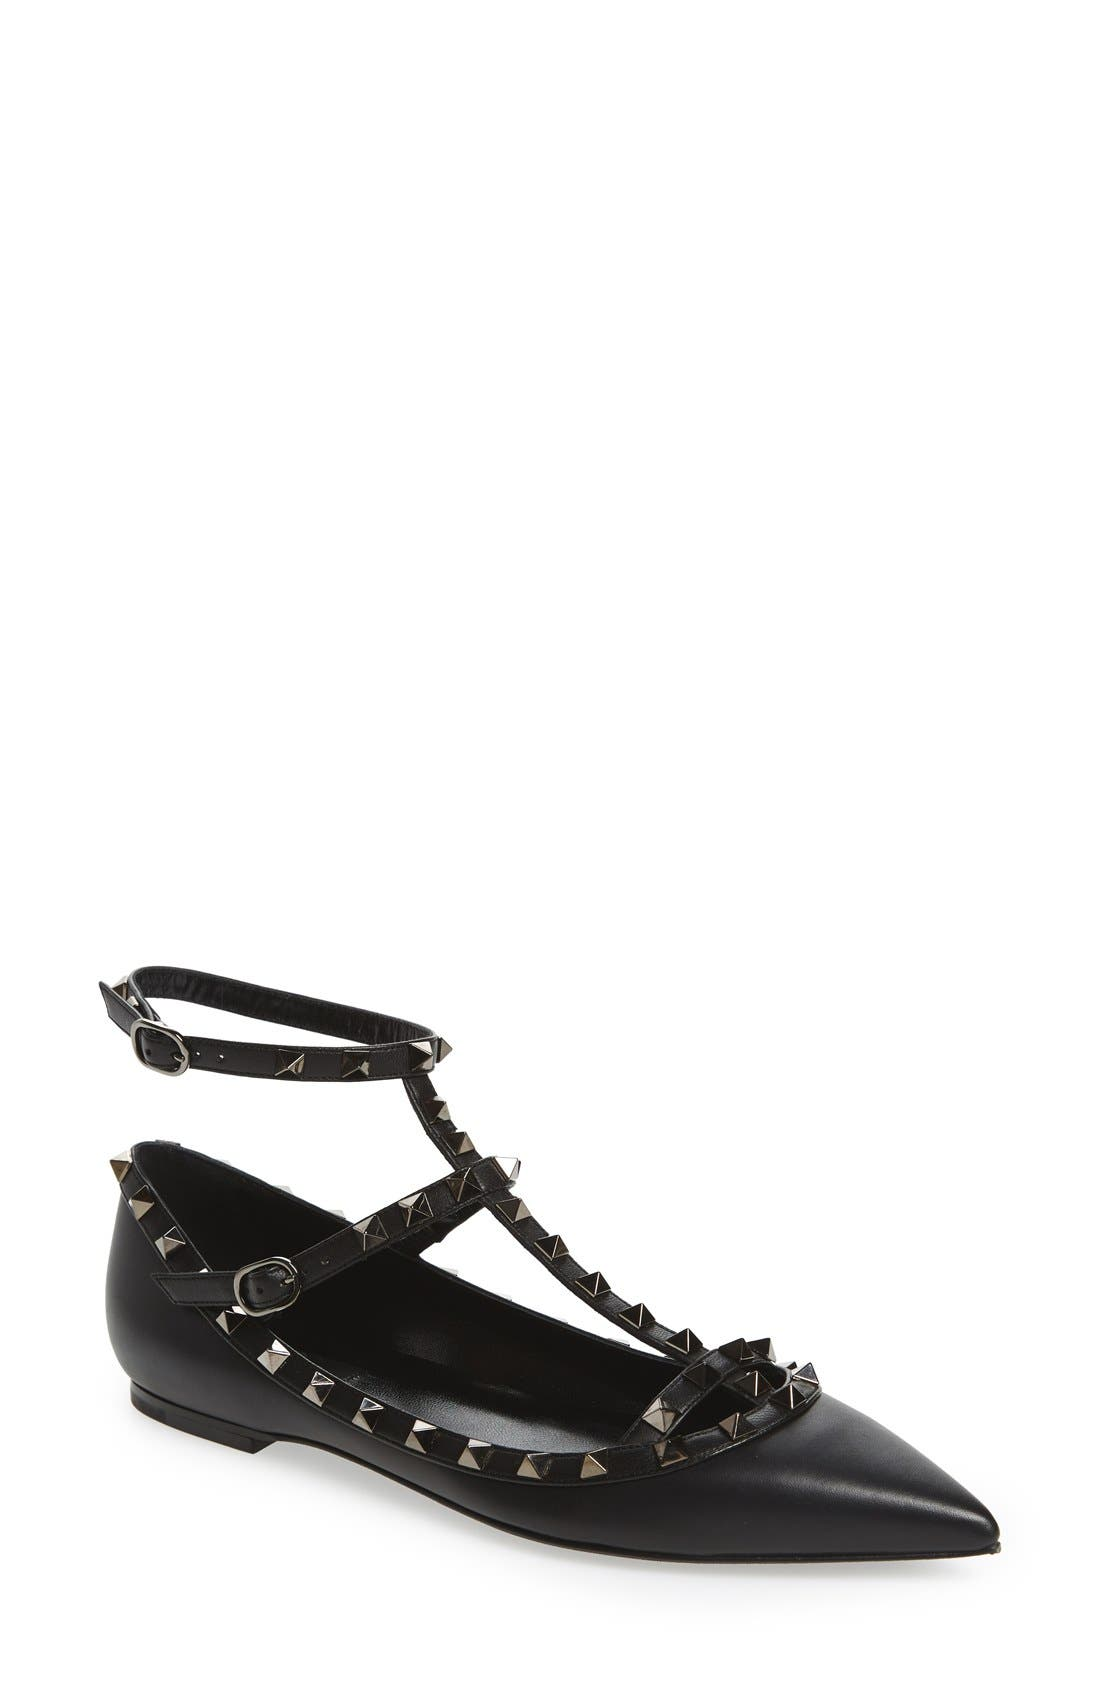 Main Image - VALENTINO GARAVANI 'Rockstud' Double Ankle Strap Pointy Toe Flat